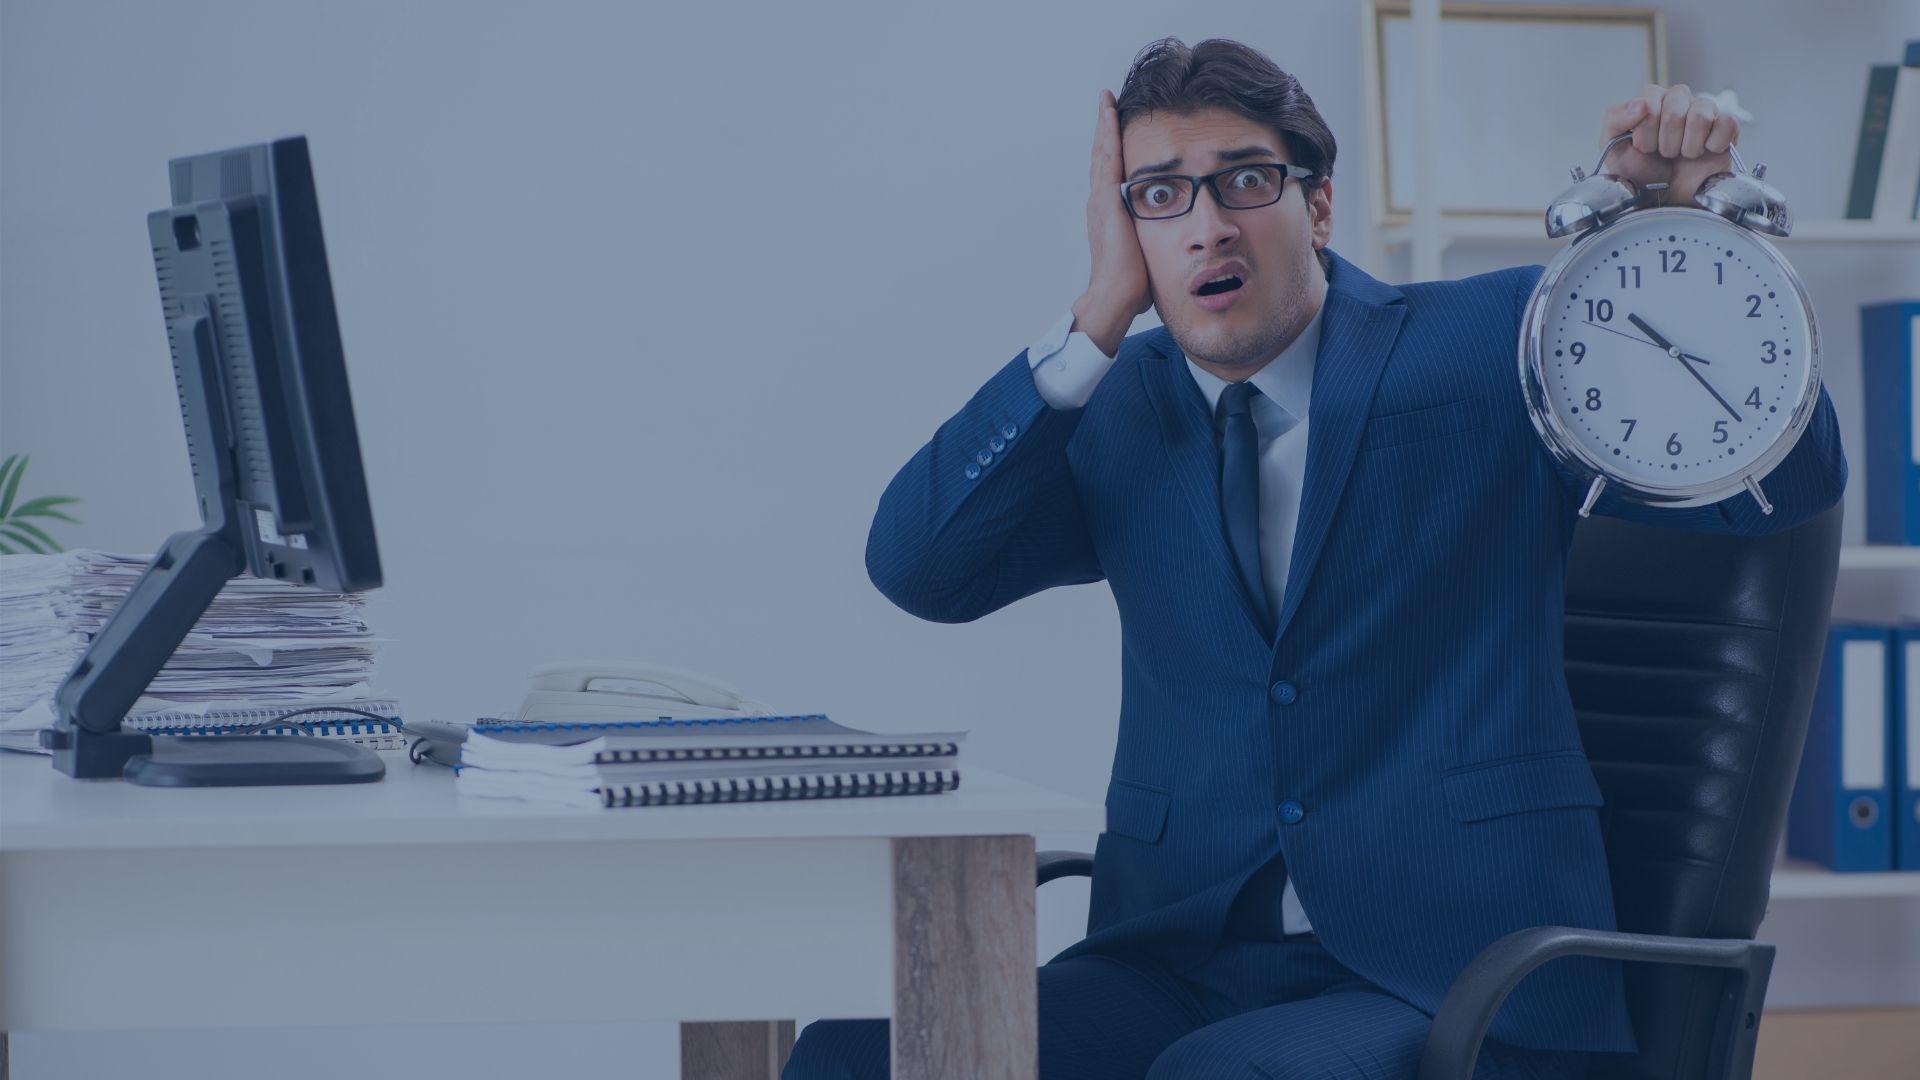 How-To-Create-Urgency-In-Sales-1-Modern-Sales-Training